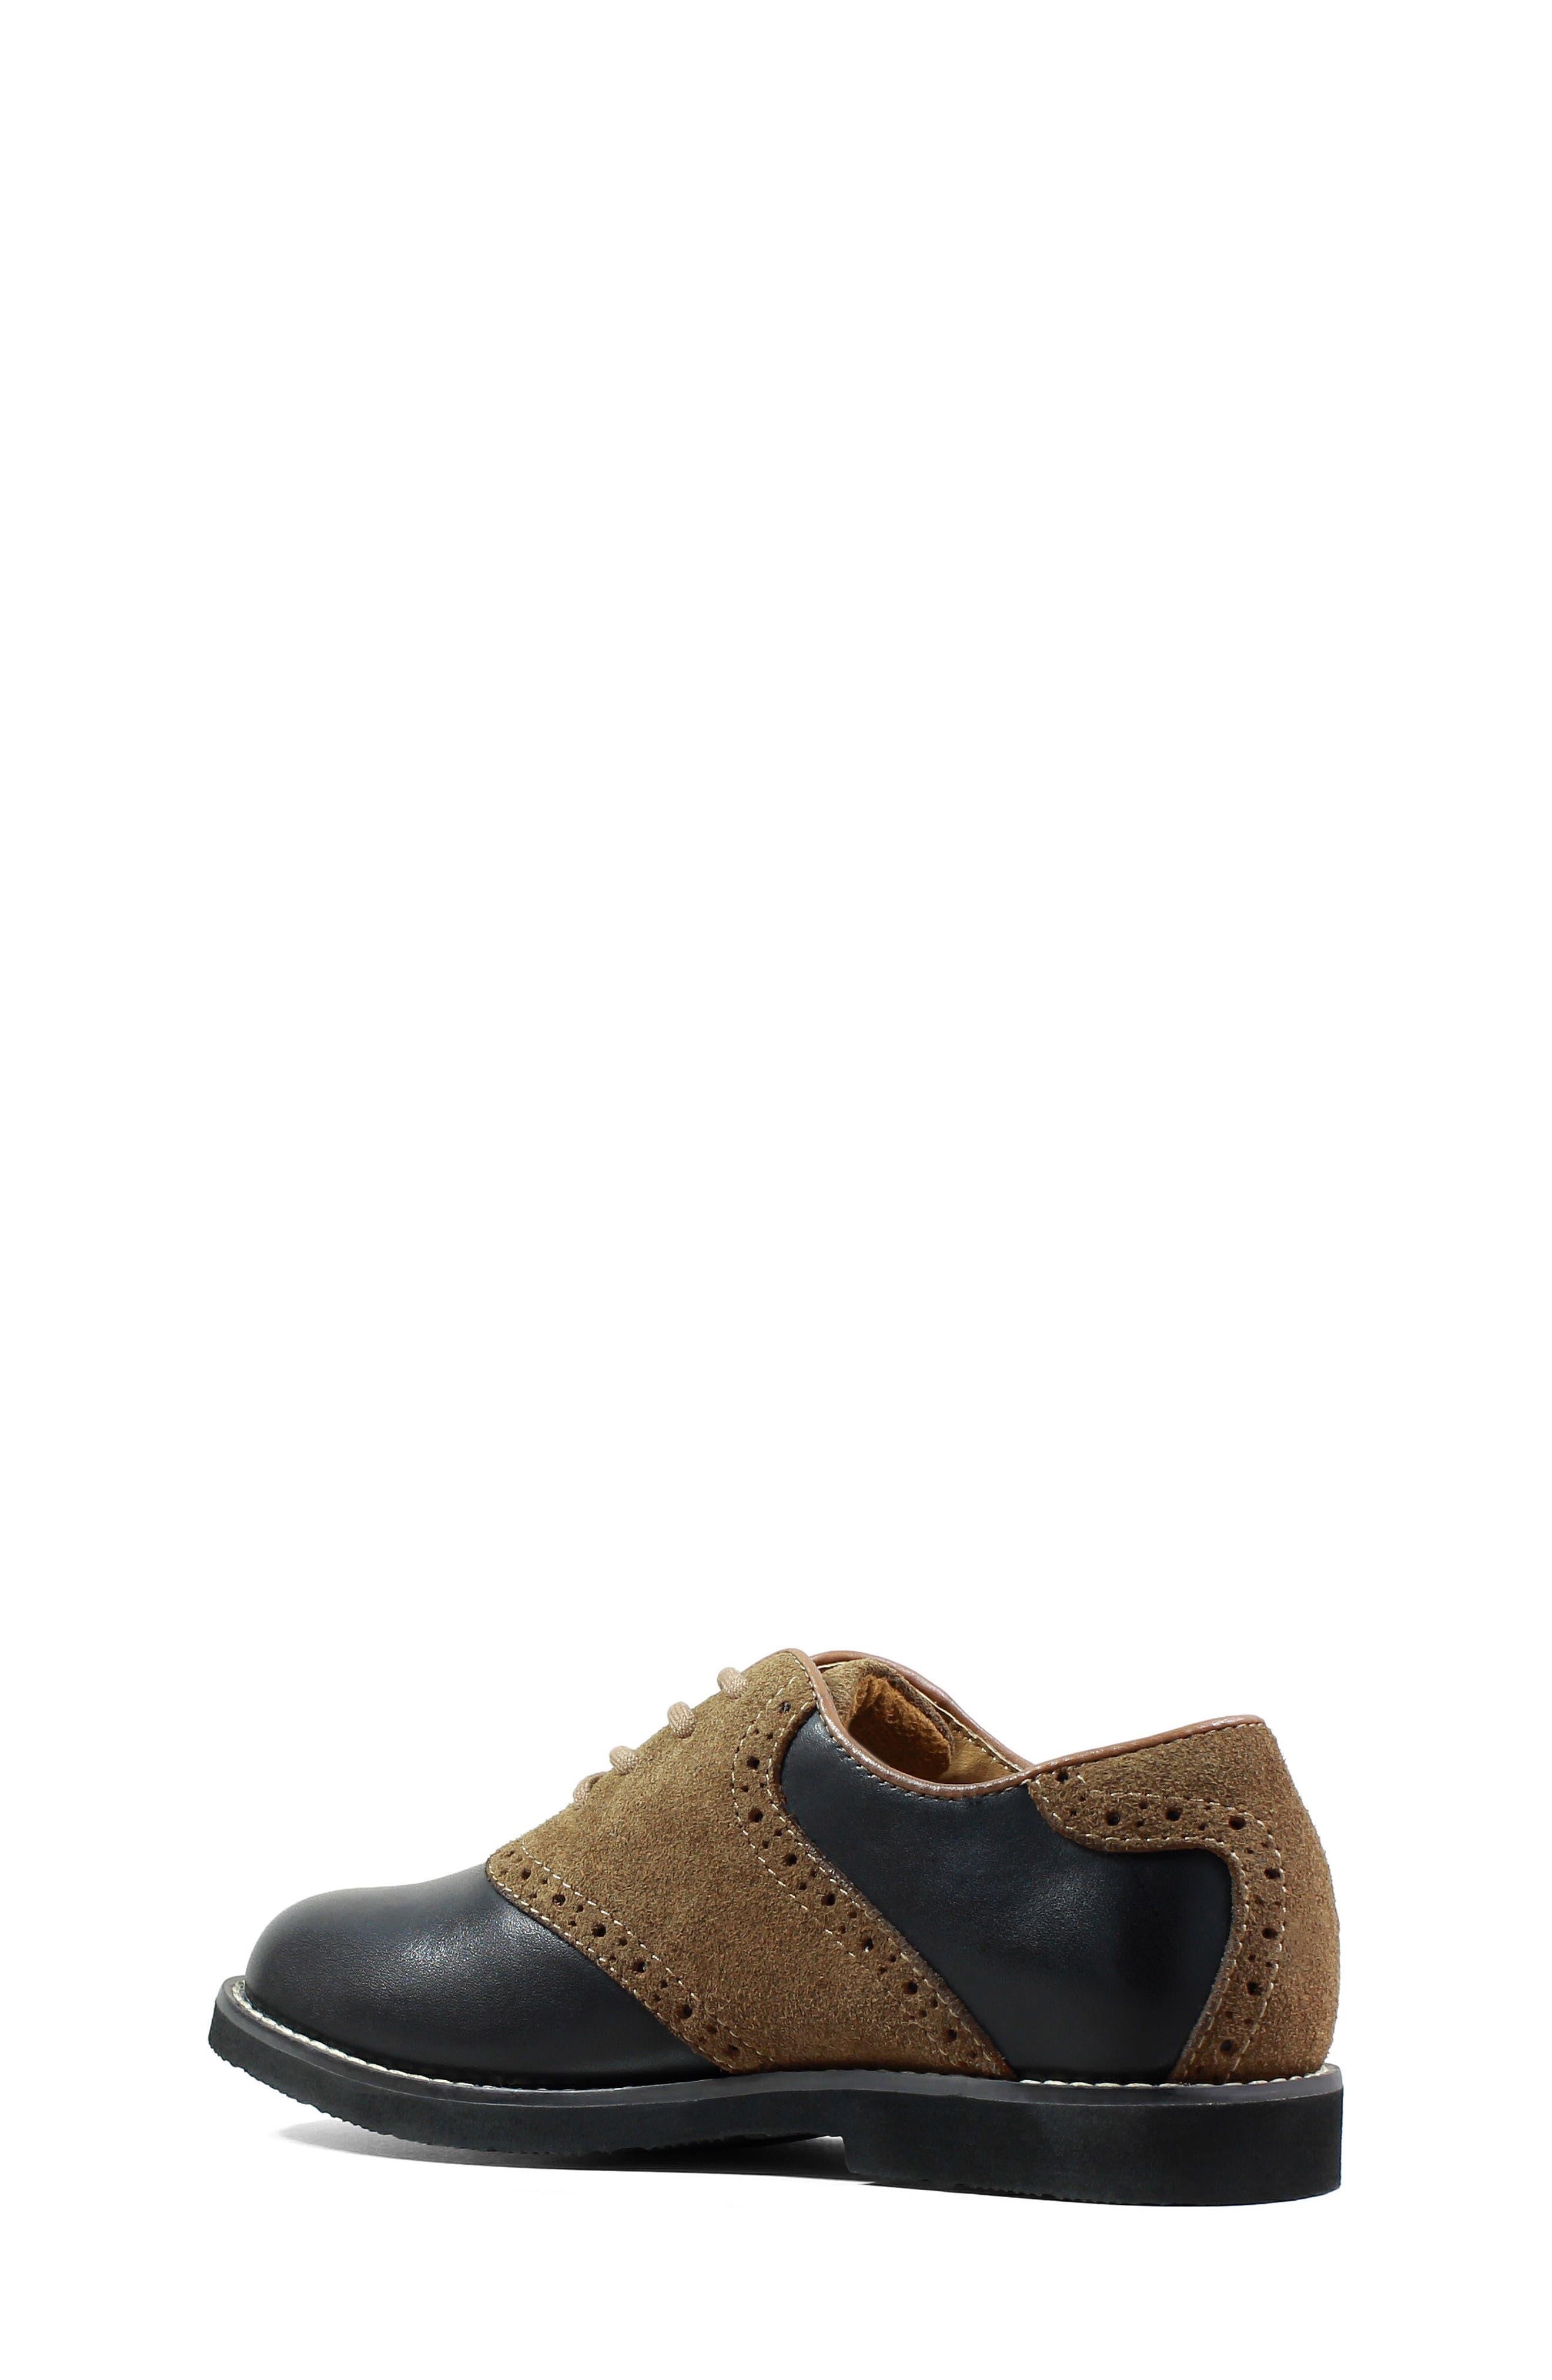 'Kennett Jr. II' Saddle Shoe,                             Main thumbnail 1, color,                             SMOOTH BLACK W/ MOCHA SUEDE